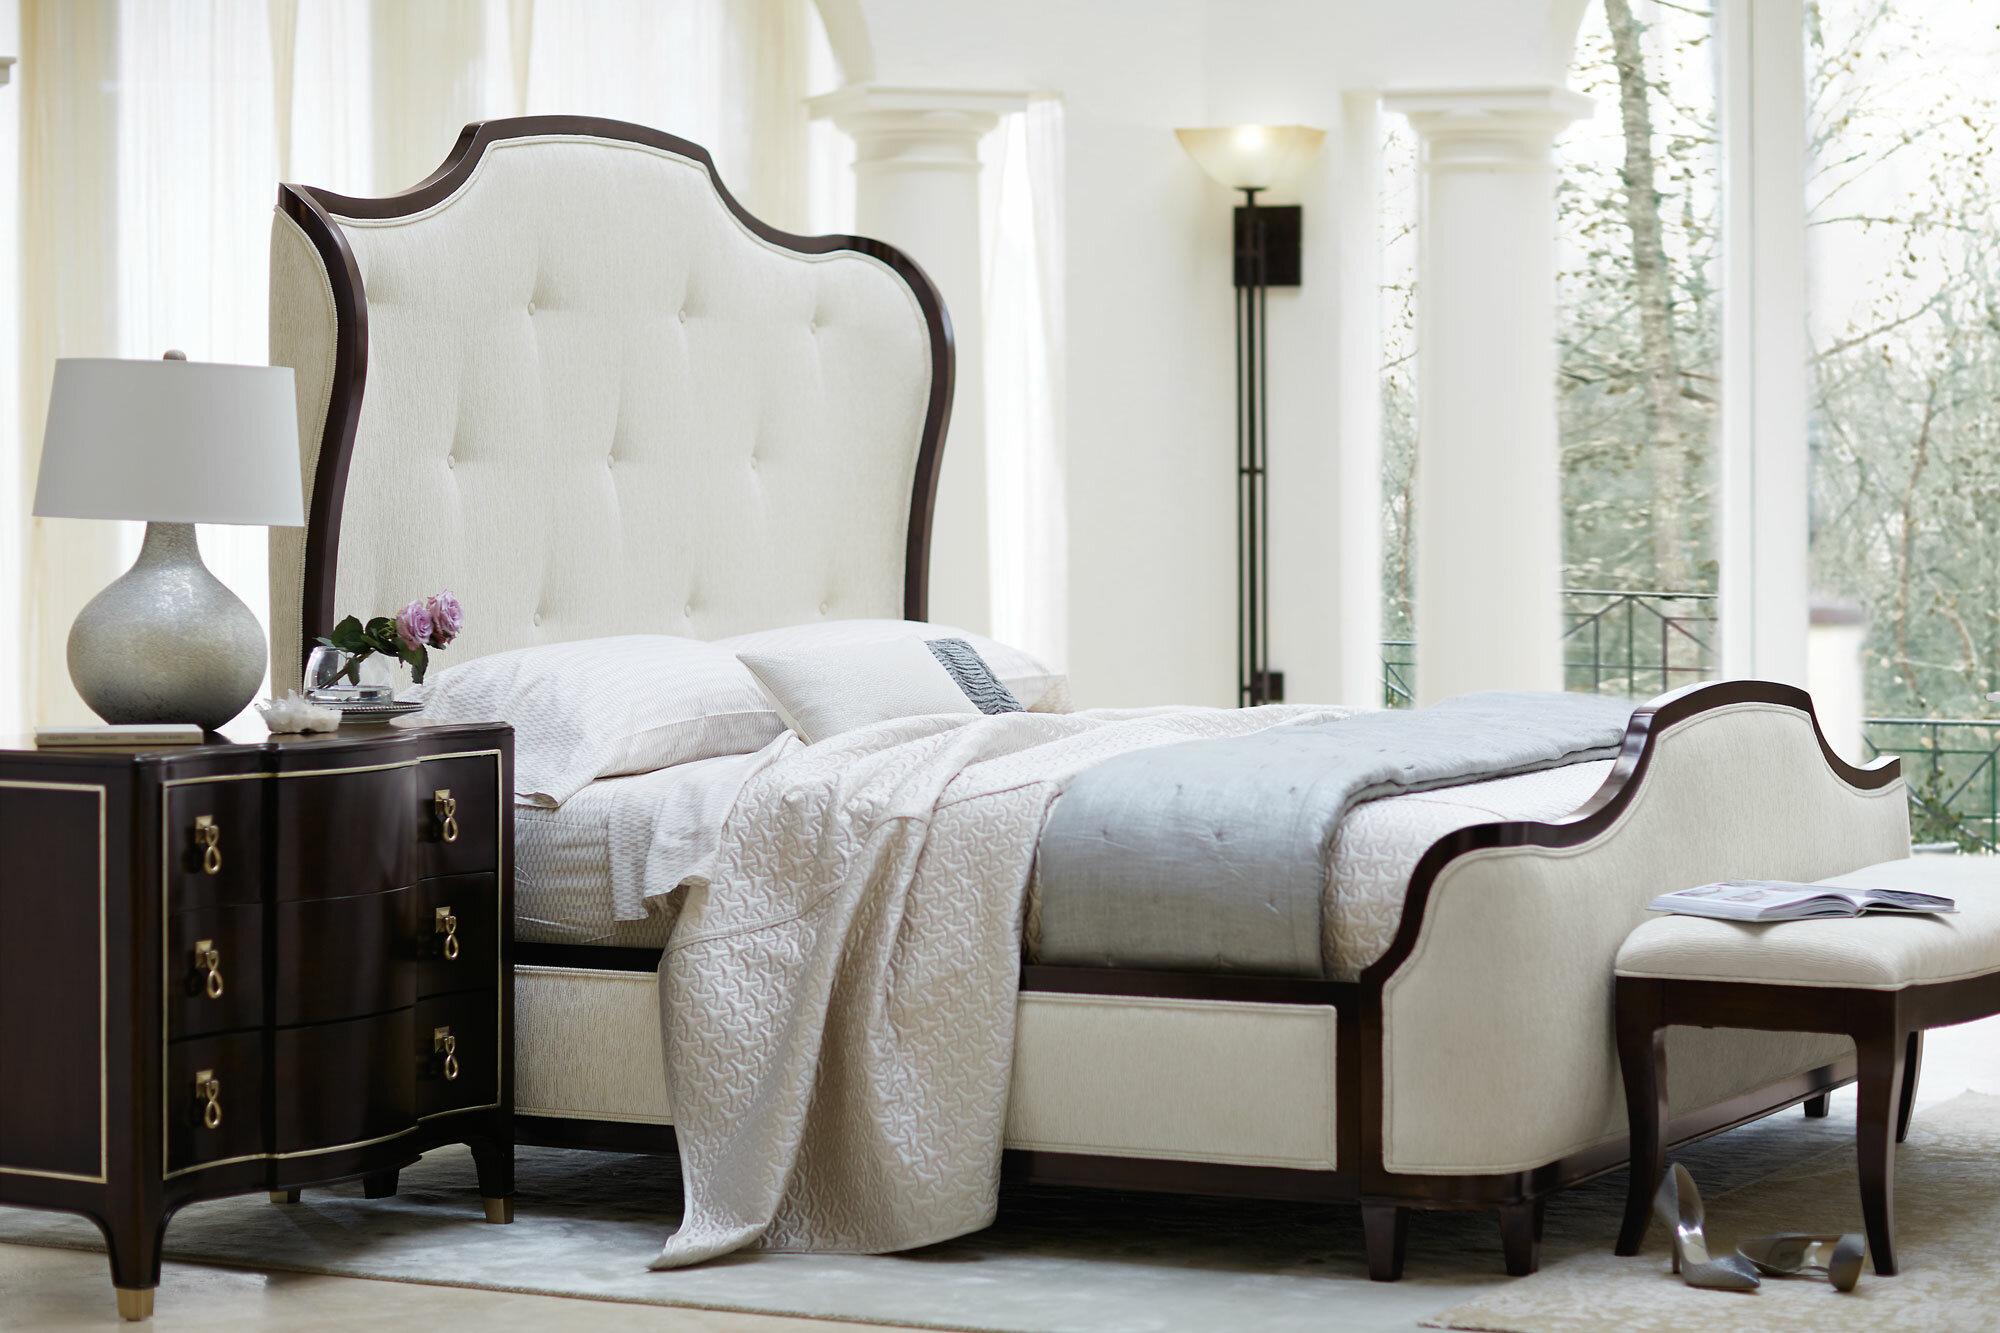 Stupendous Miramont King Upholstered Standard Bed Interior Design Ideas Clesiryabchikinfo